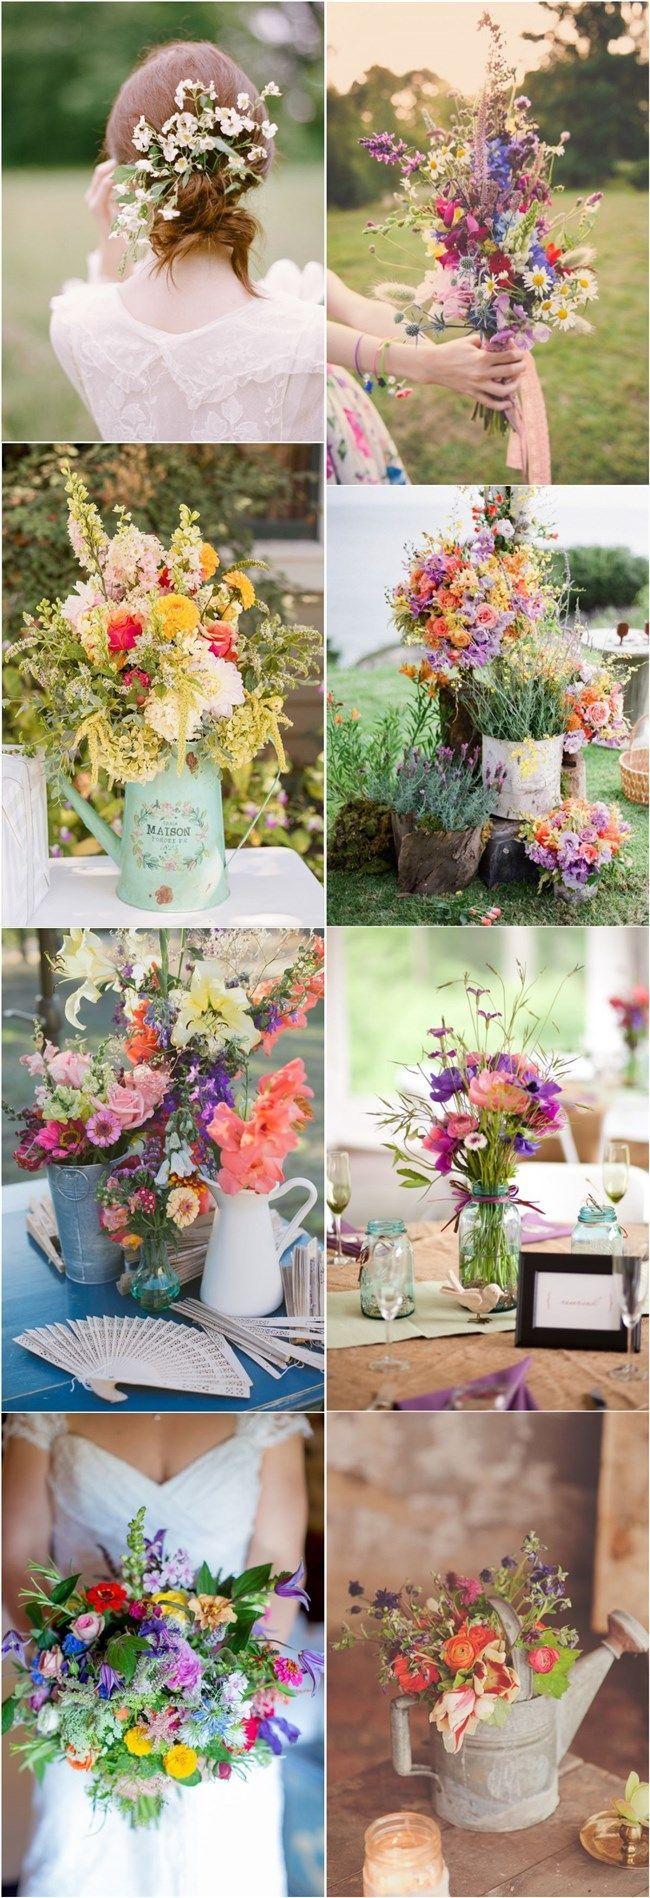 50+ Wildflowers Wedding Ideas for Rustic / Boho Weddings